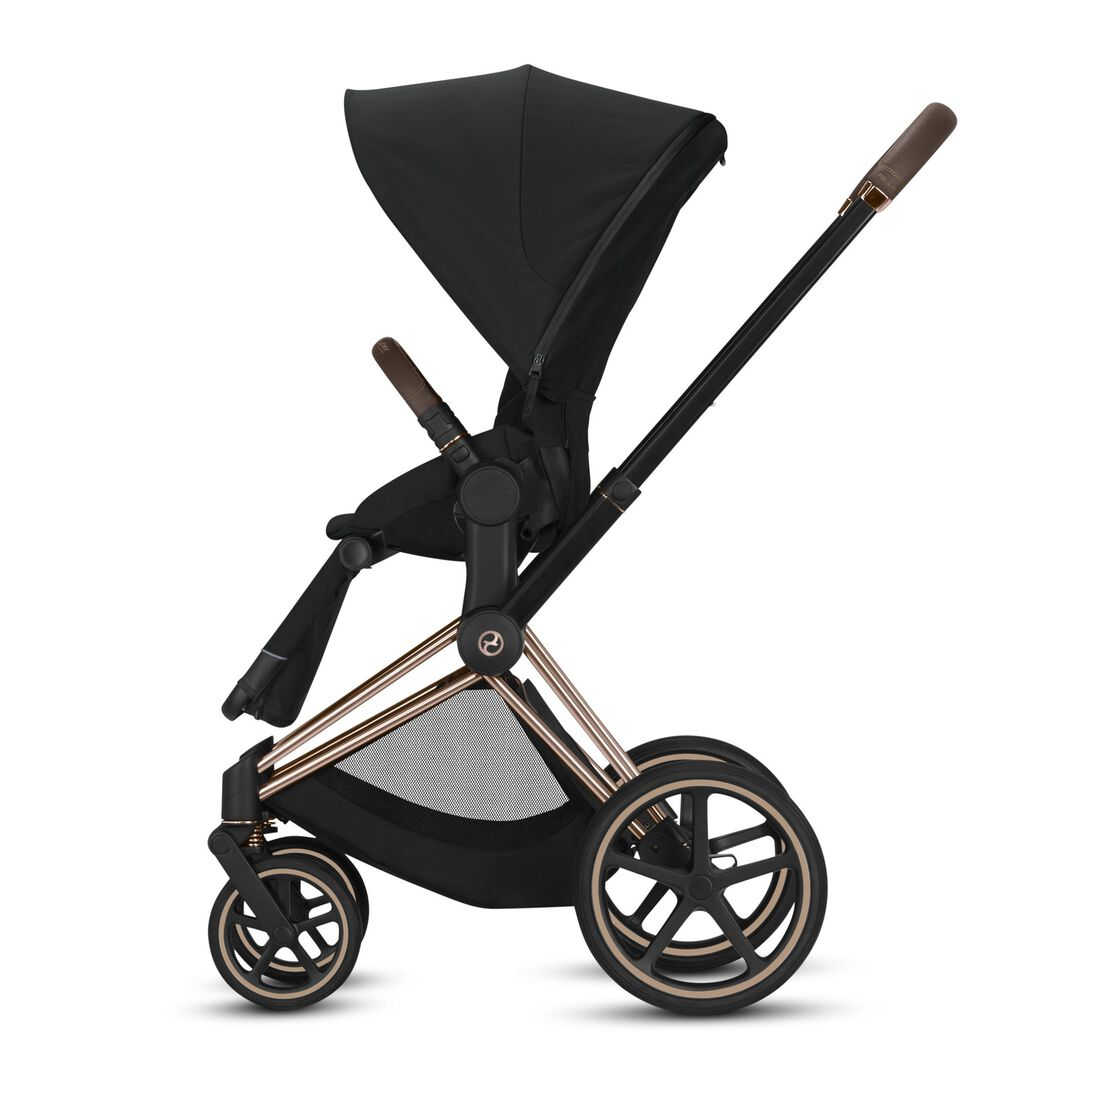 CYBEX Beezy Buggy - Adjustable legrest